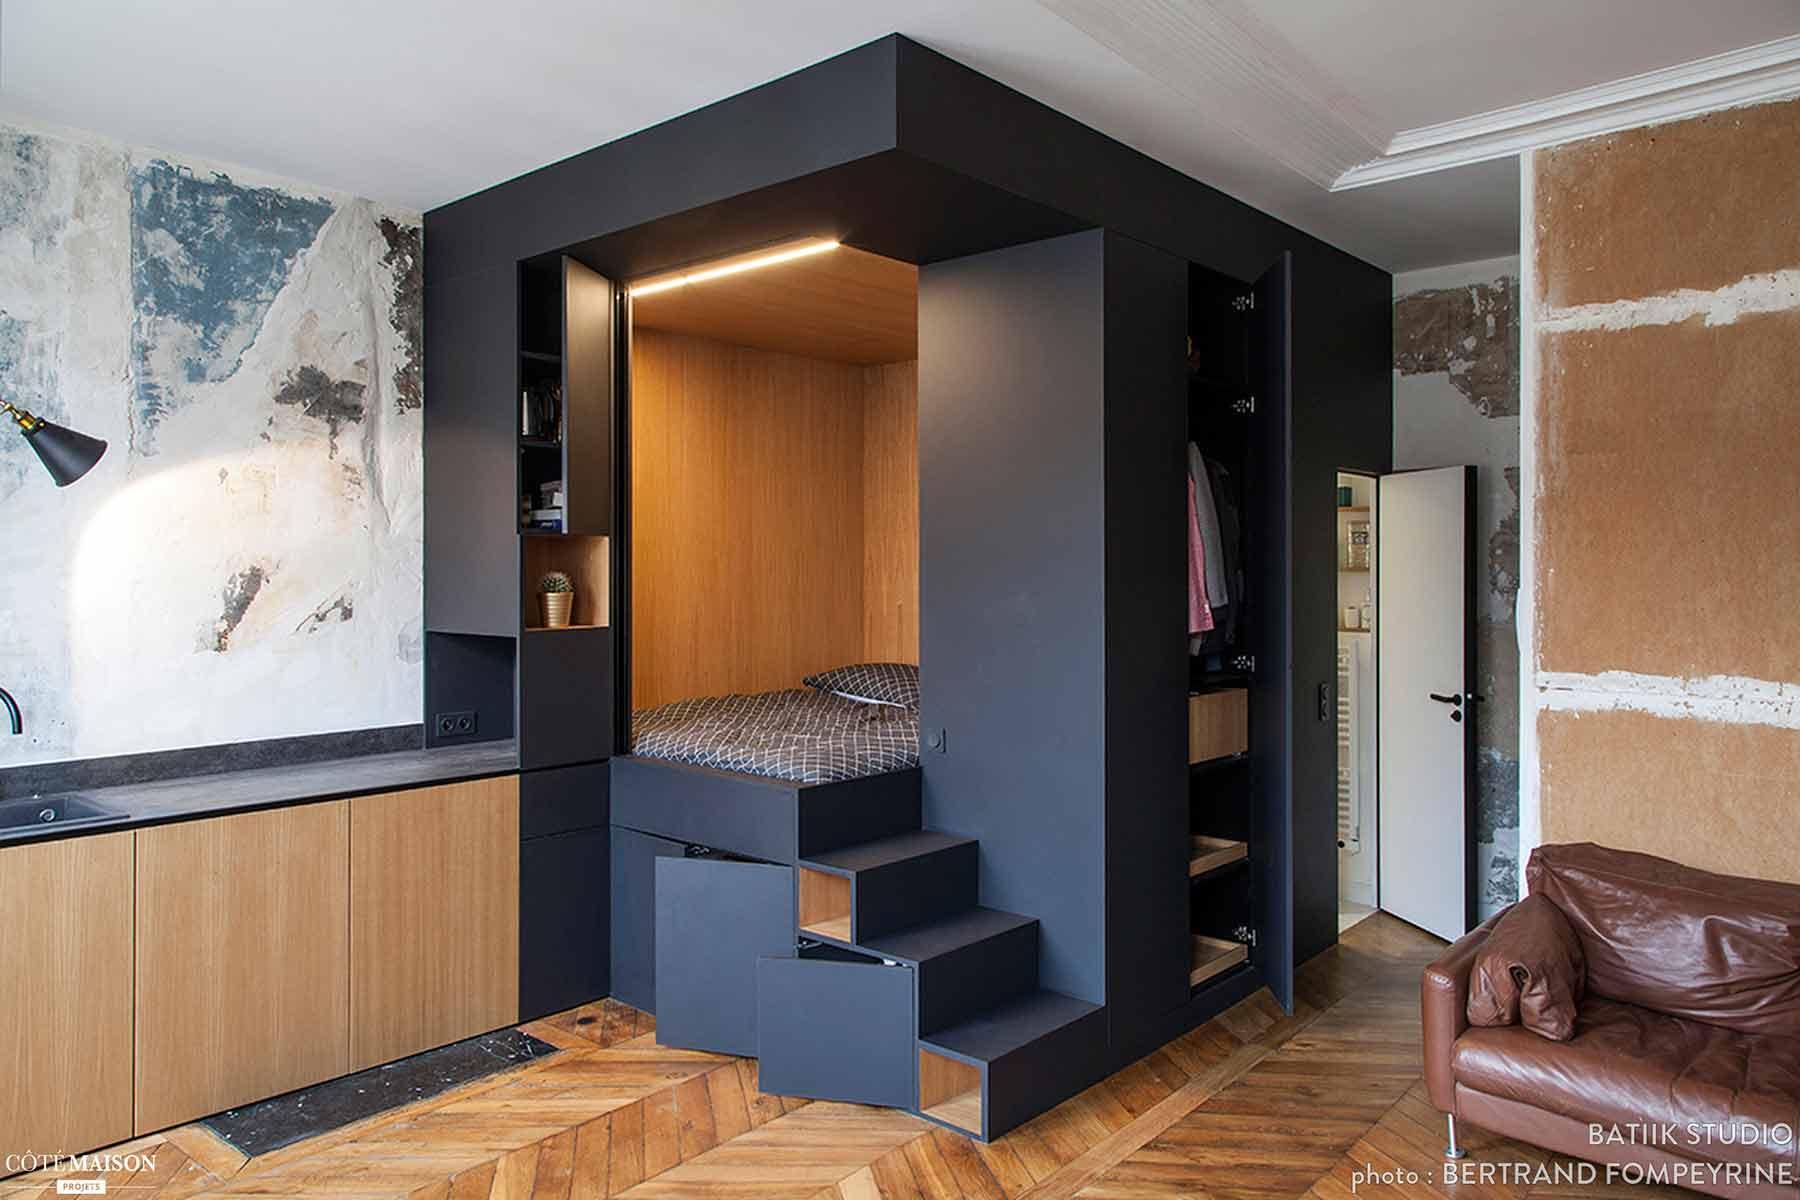 Interior kamar tidur hemat ruang yang kreatif karya Bertrand Fompeyrine // projets.cotemaison.fr